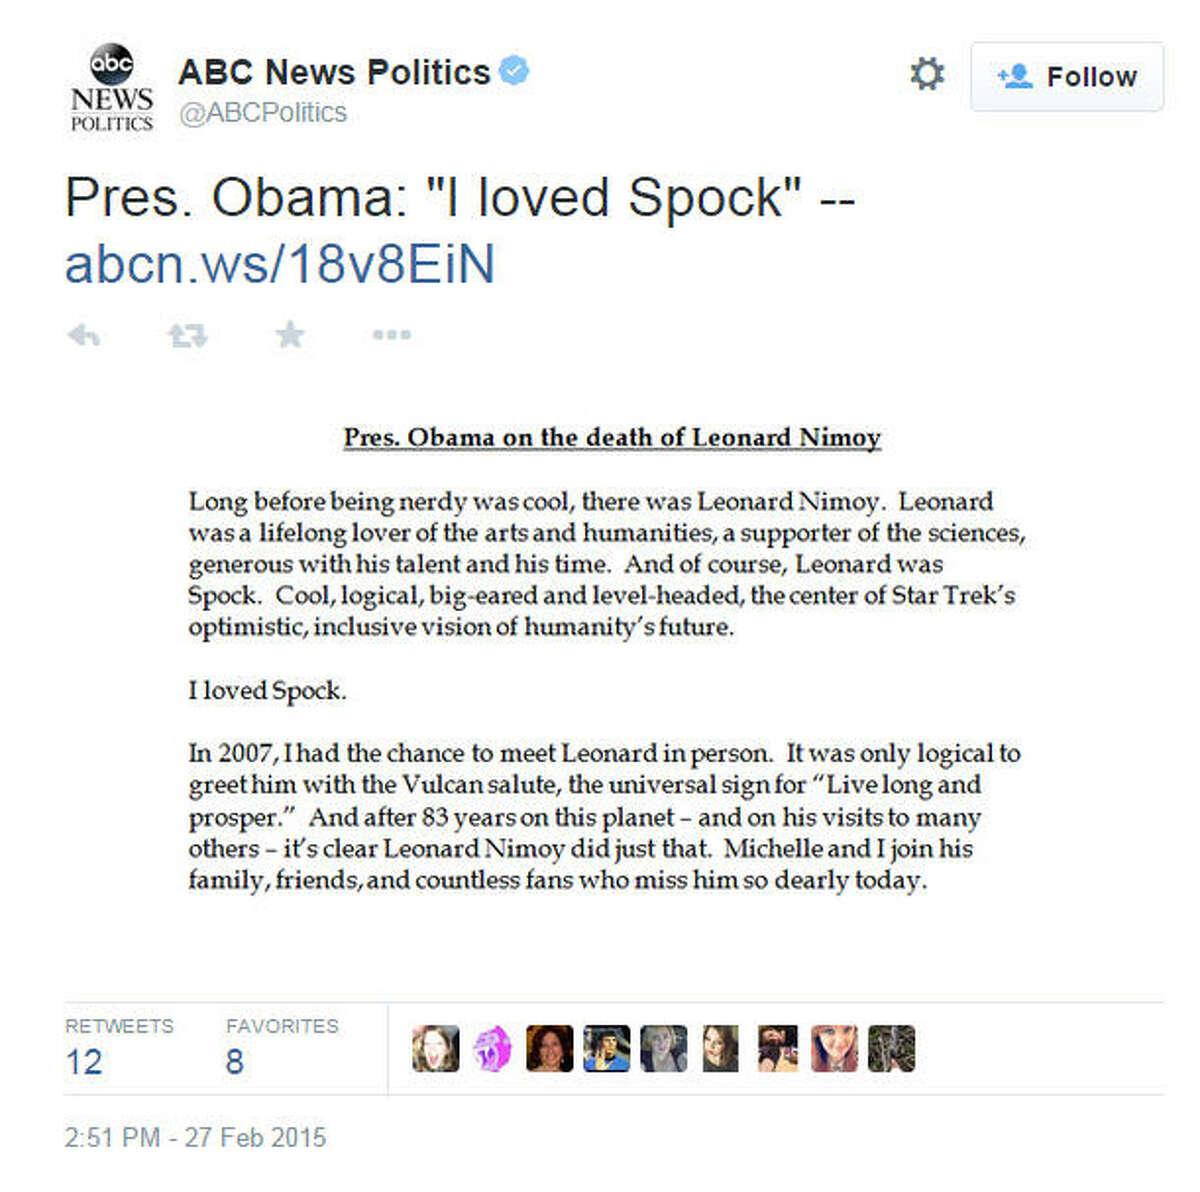 ABC News Politics